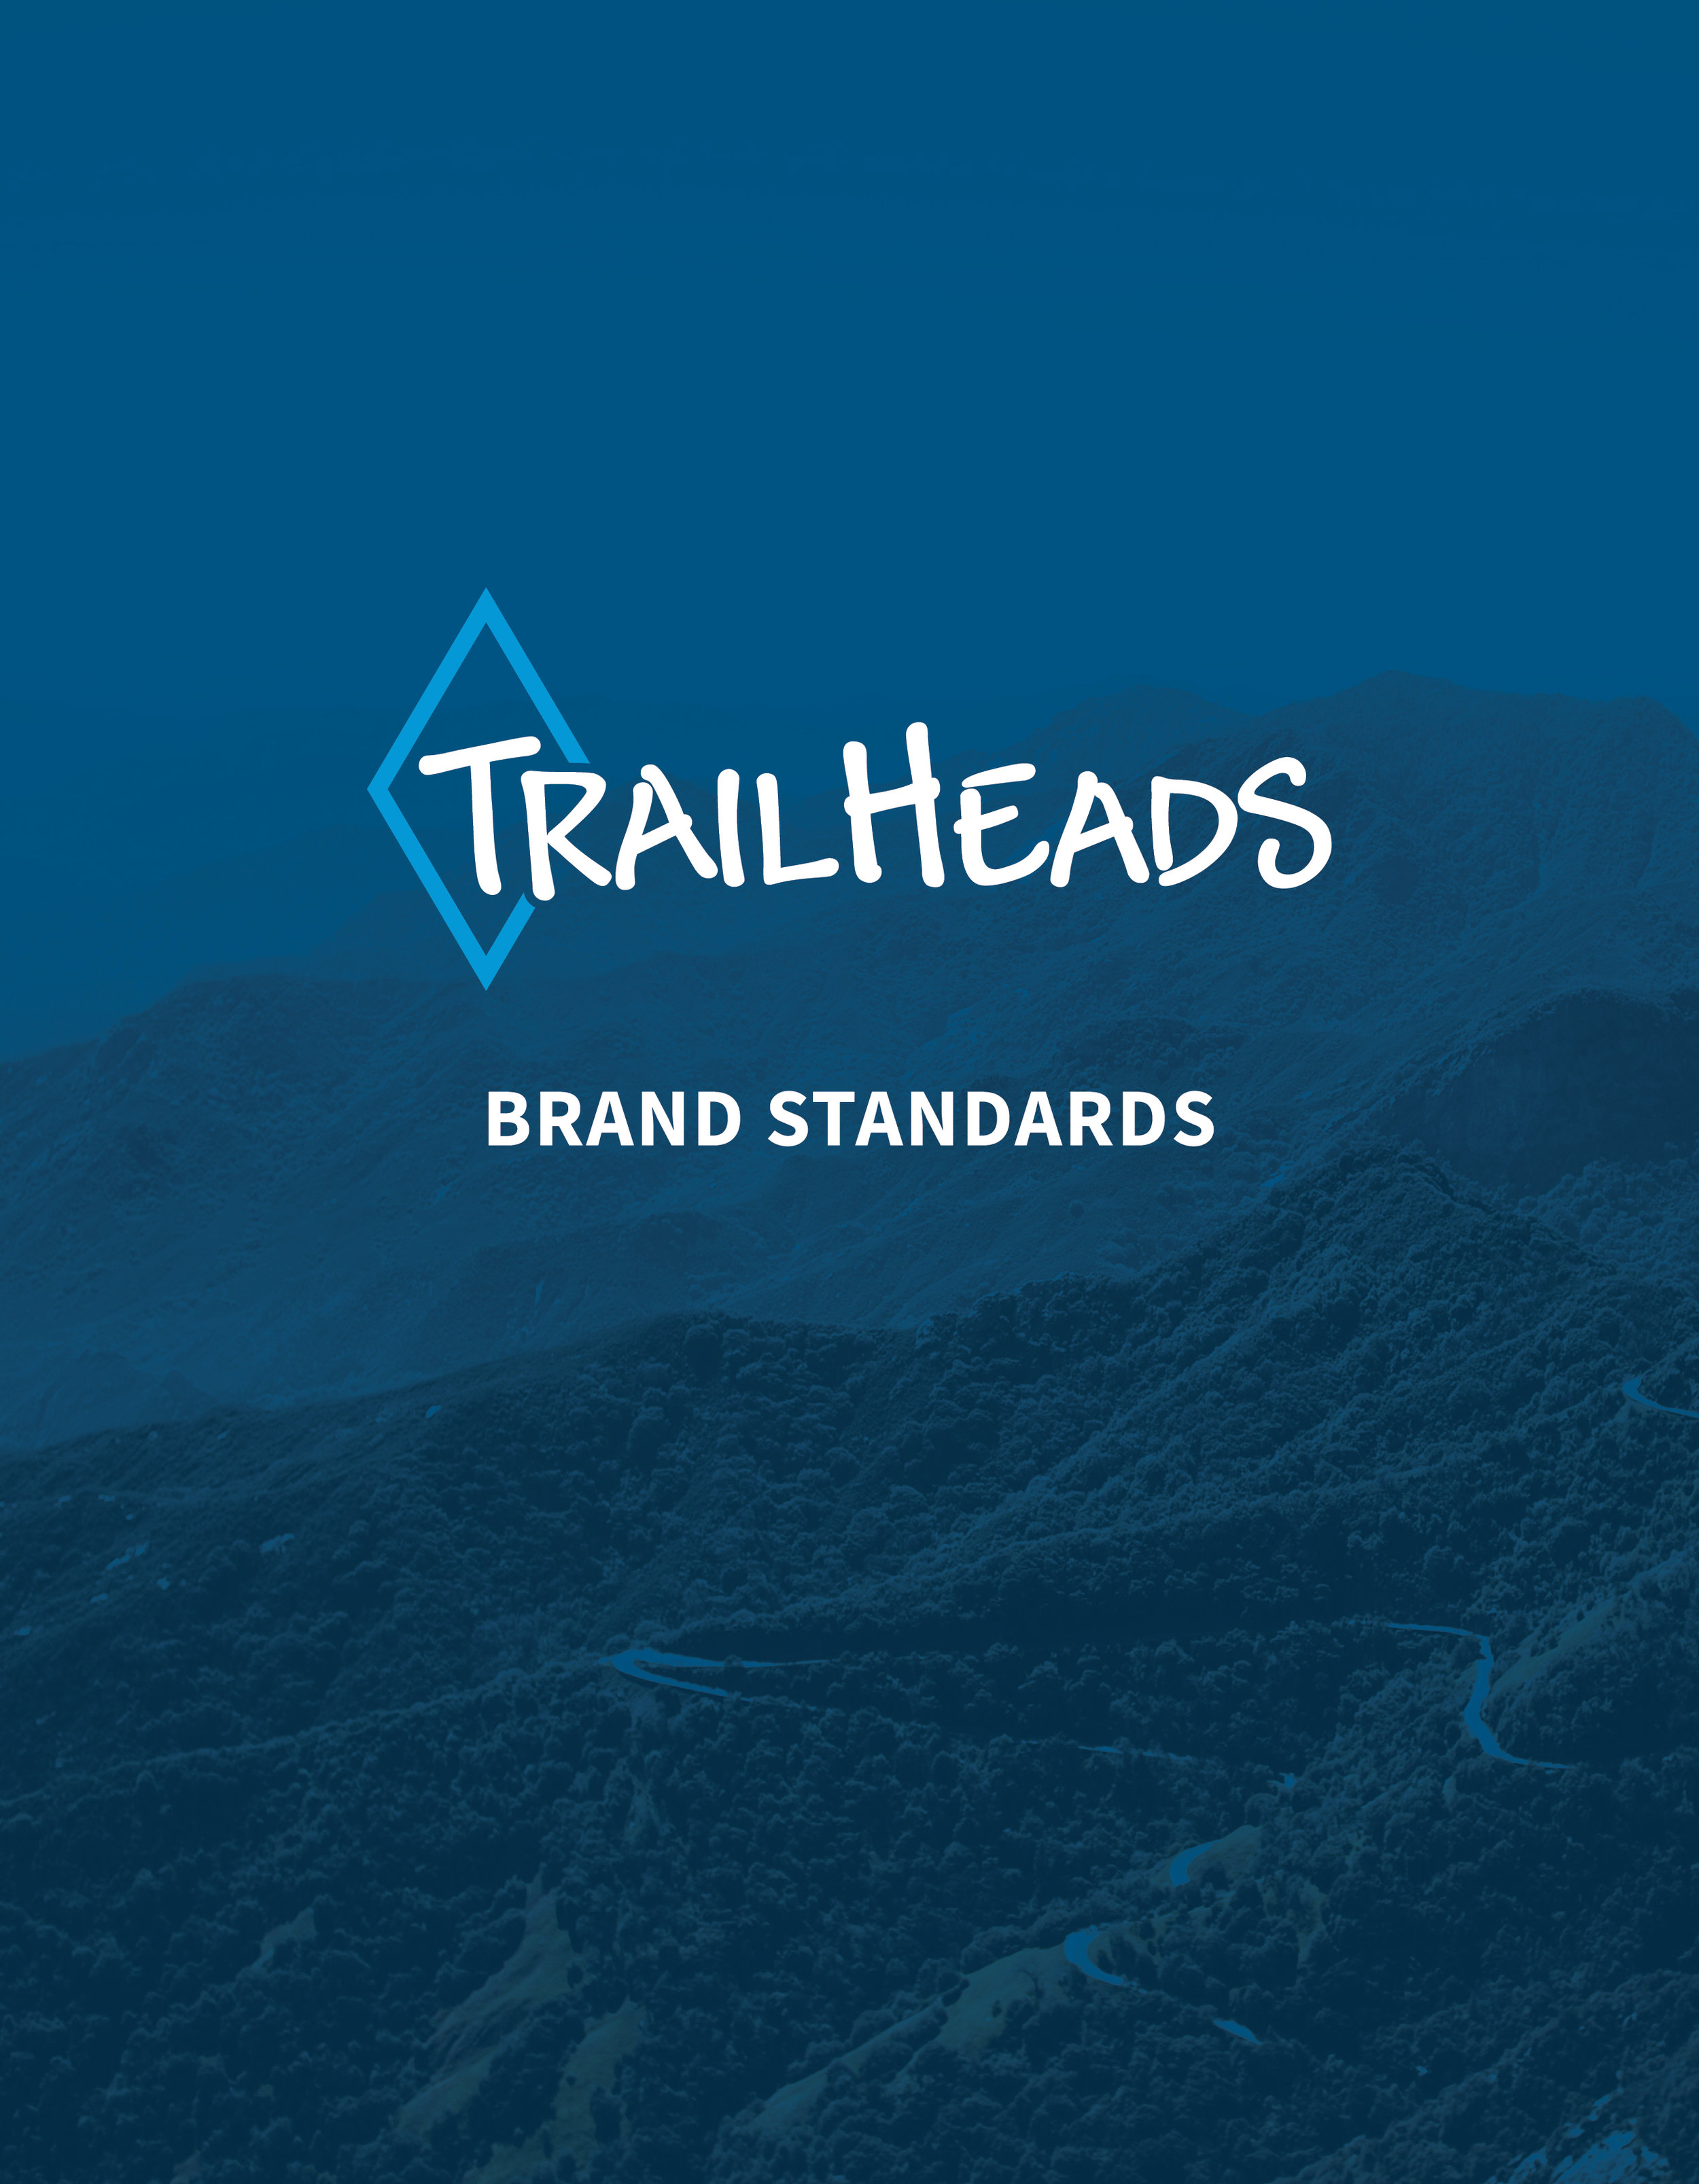 apparel-company-brand-guidelines-design-by-jordan-fretz-design-1.jpg